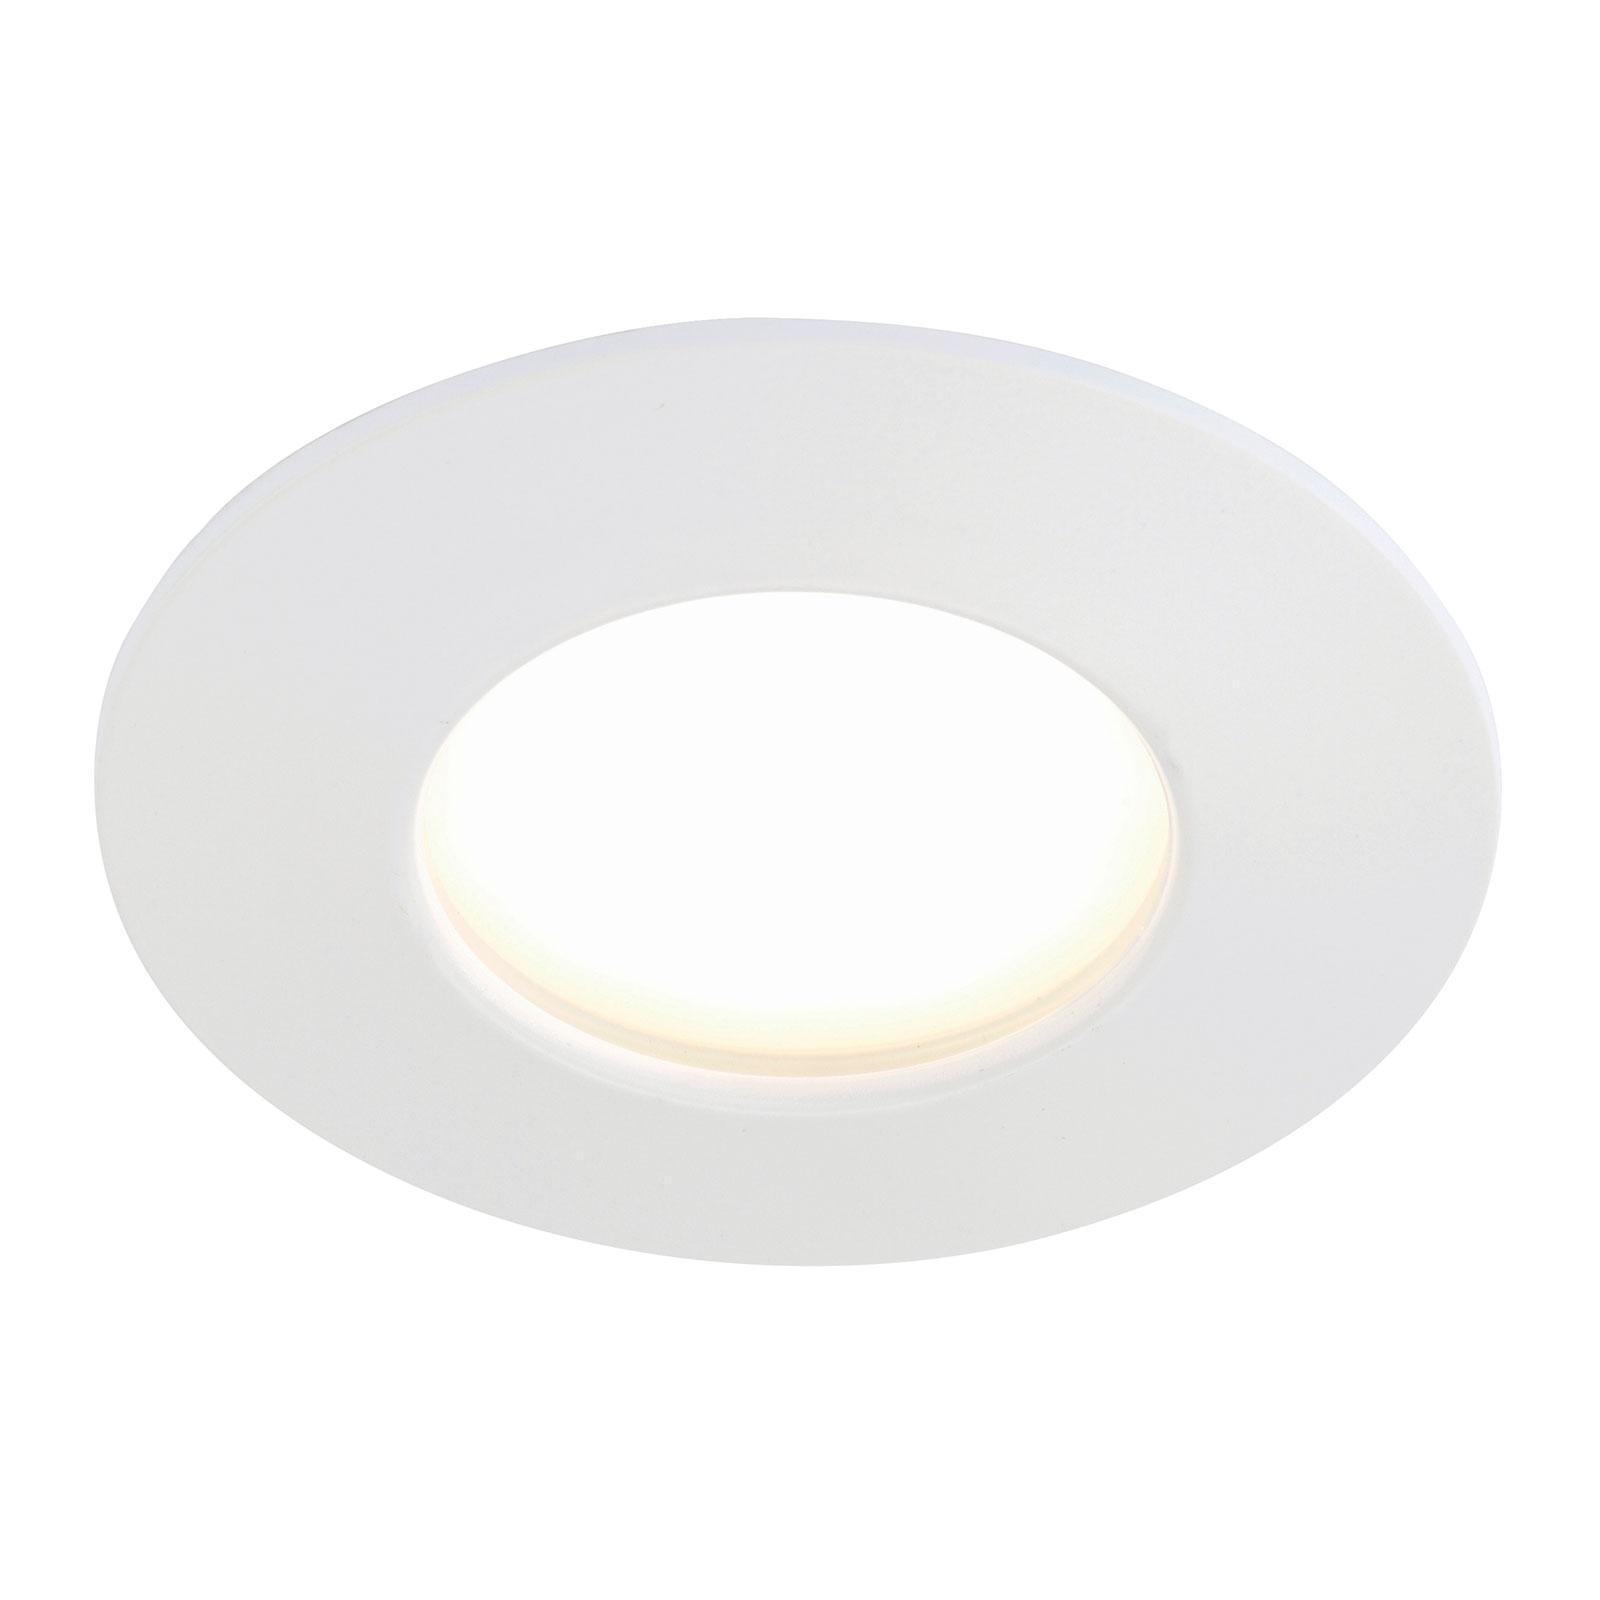 Felia hvid LED indbygningslampe, IP44